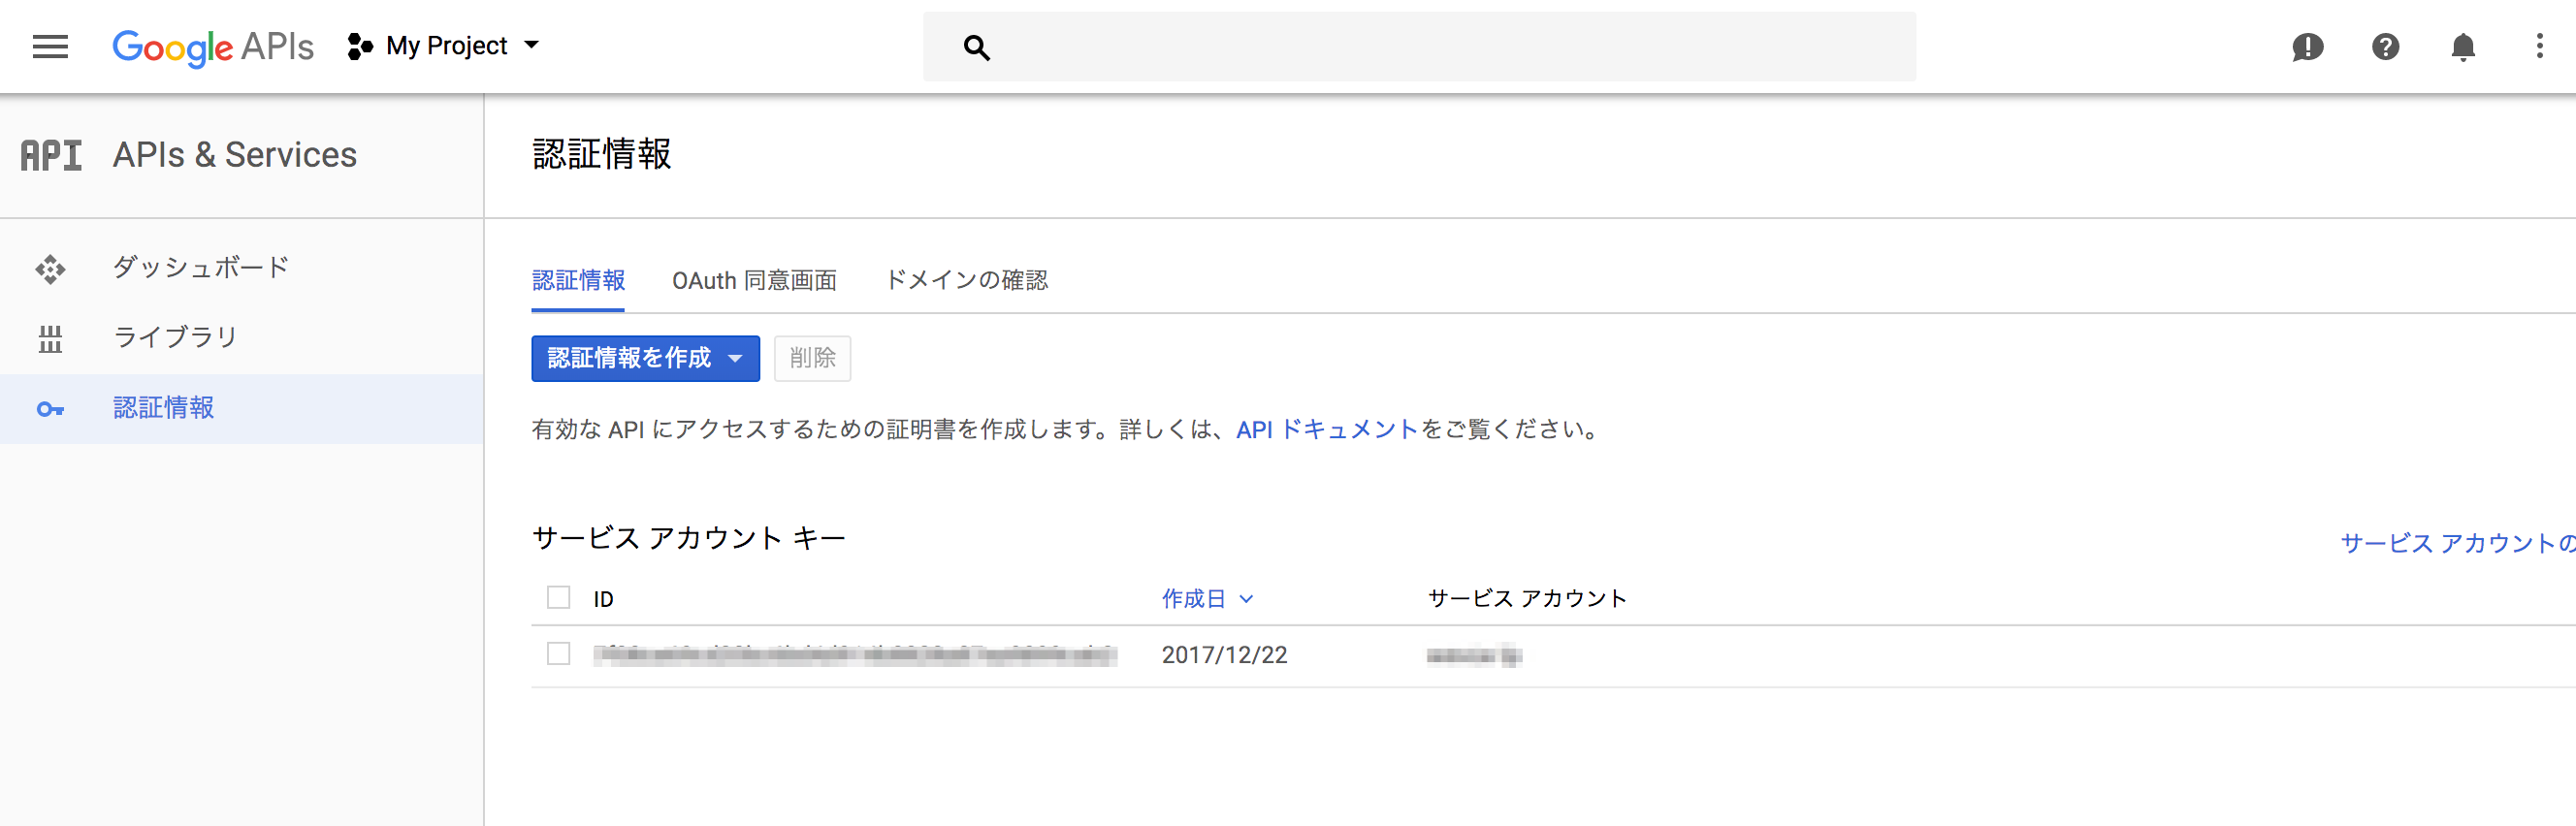 googleconsole.png